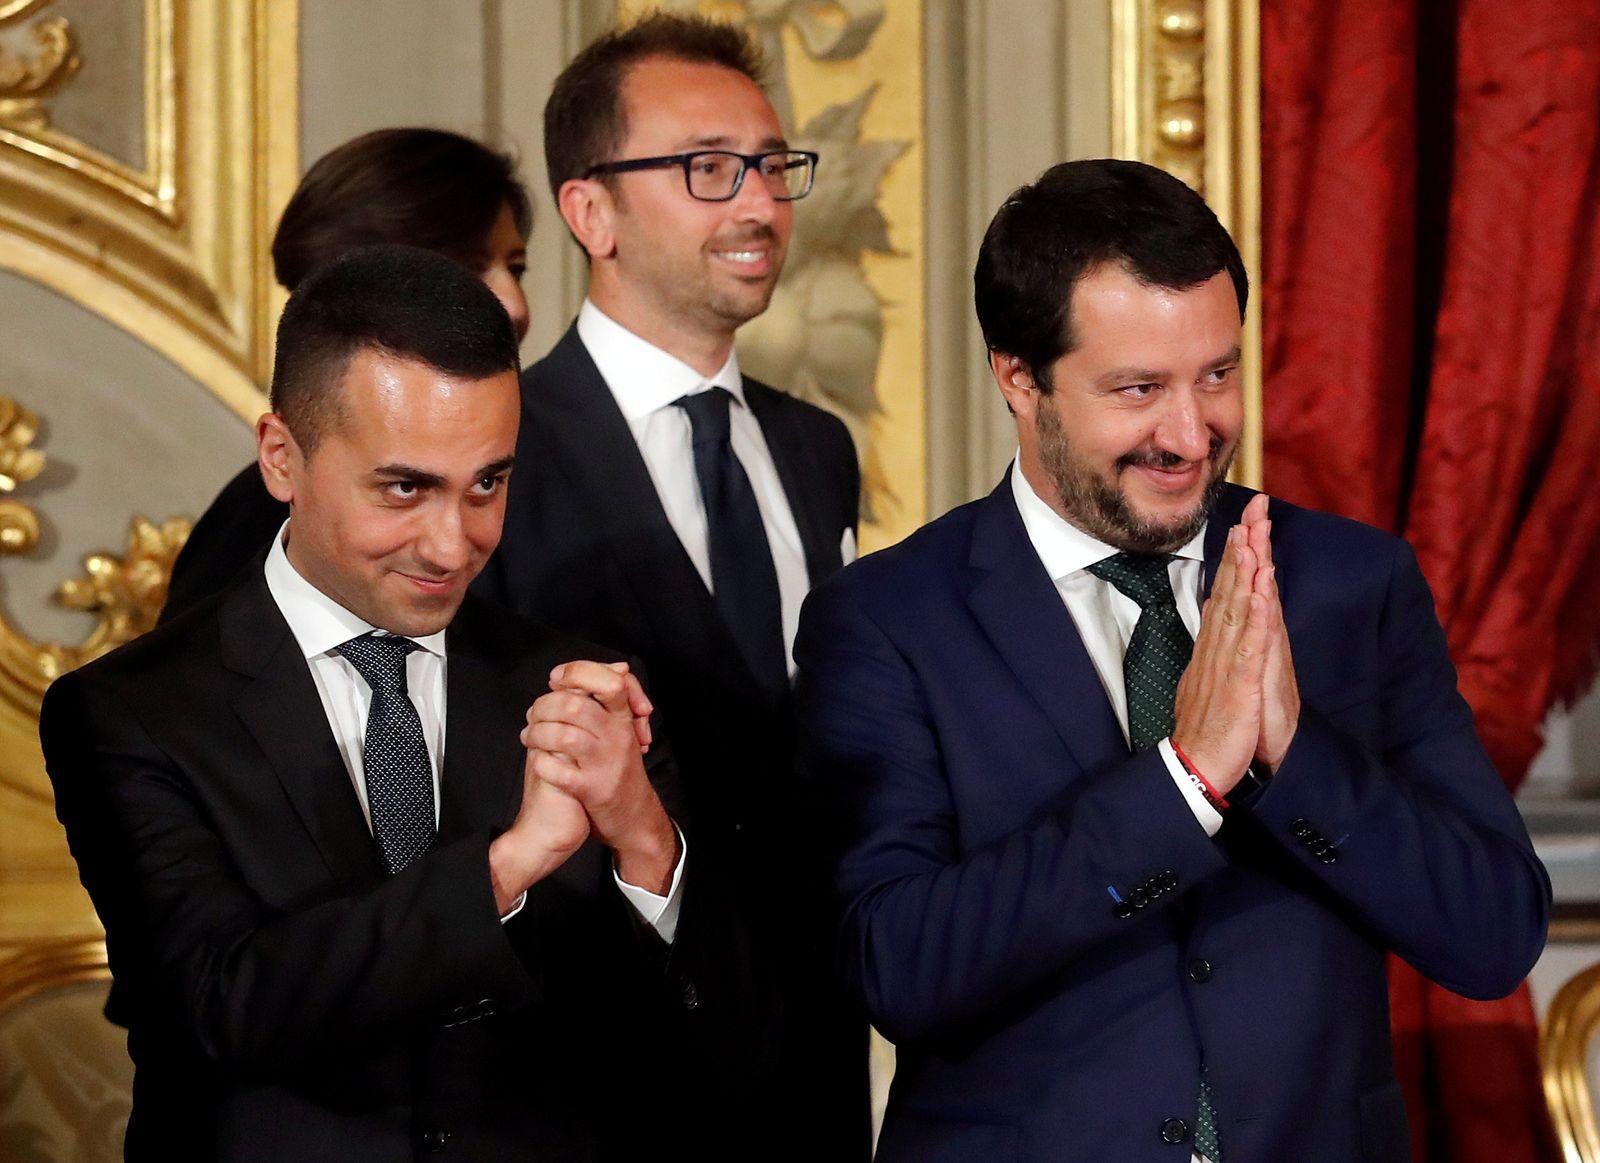 ITALY-POLITICS/GOVERNMENT